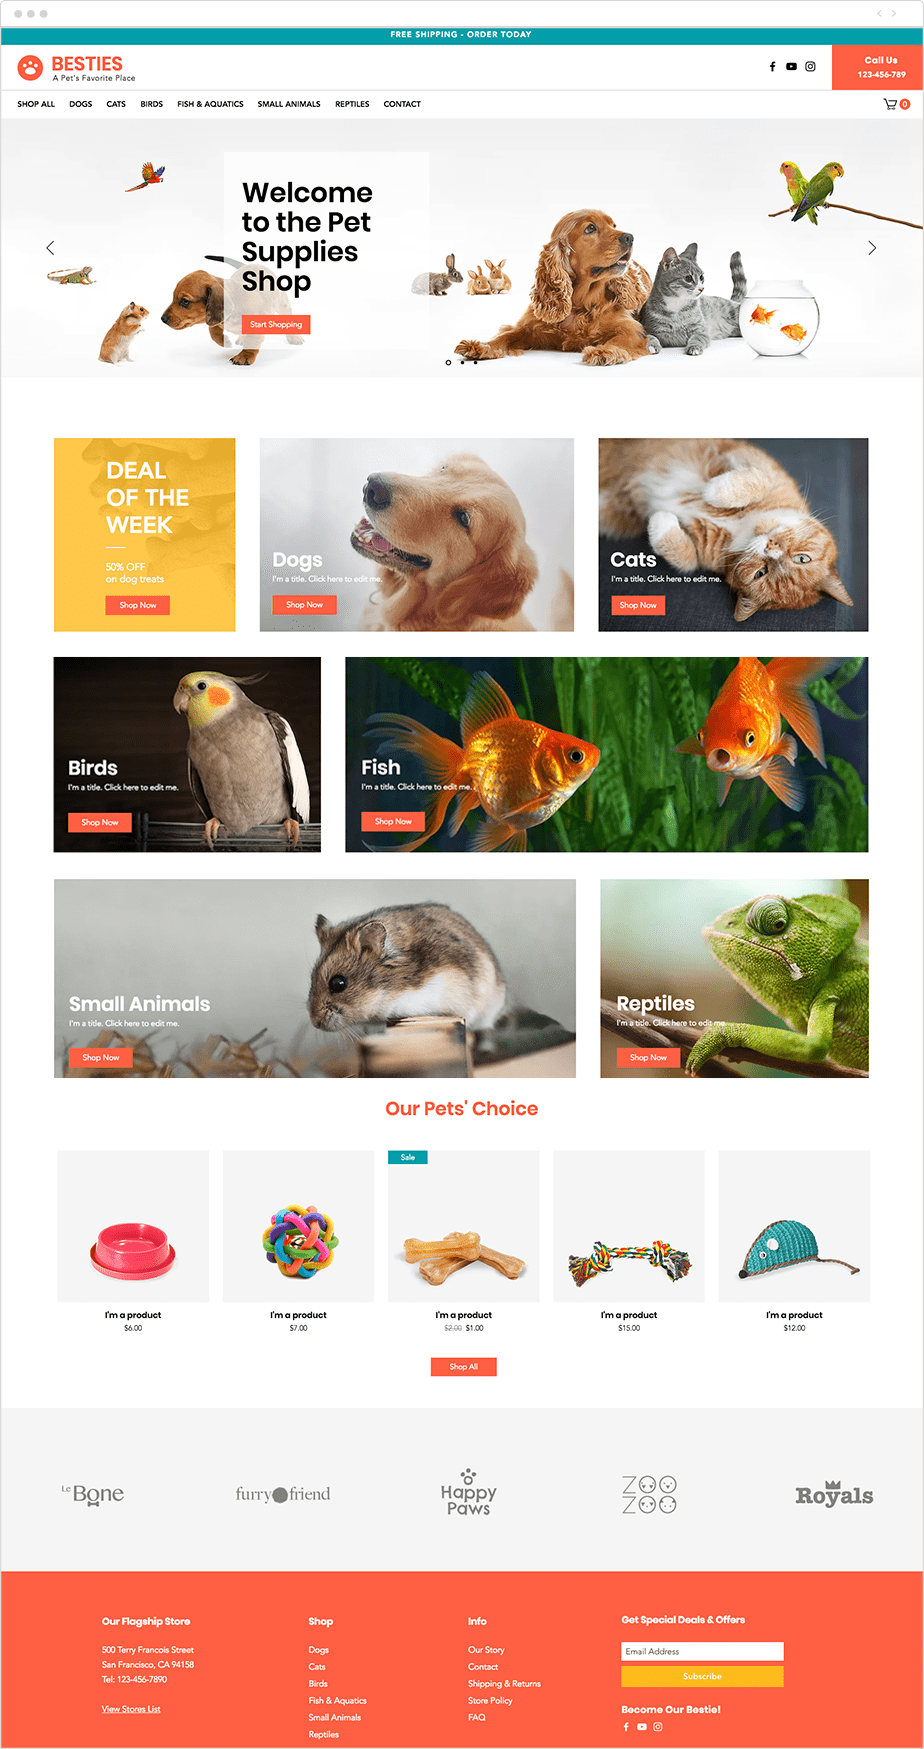 Pet supply store website template